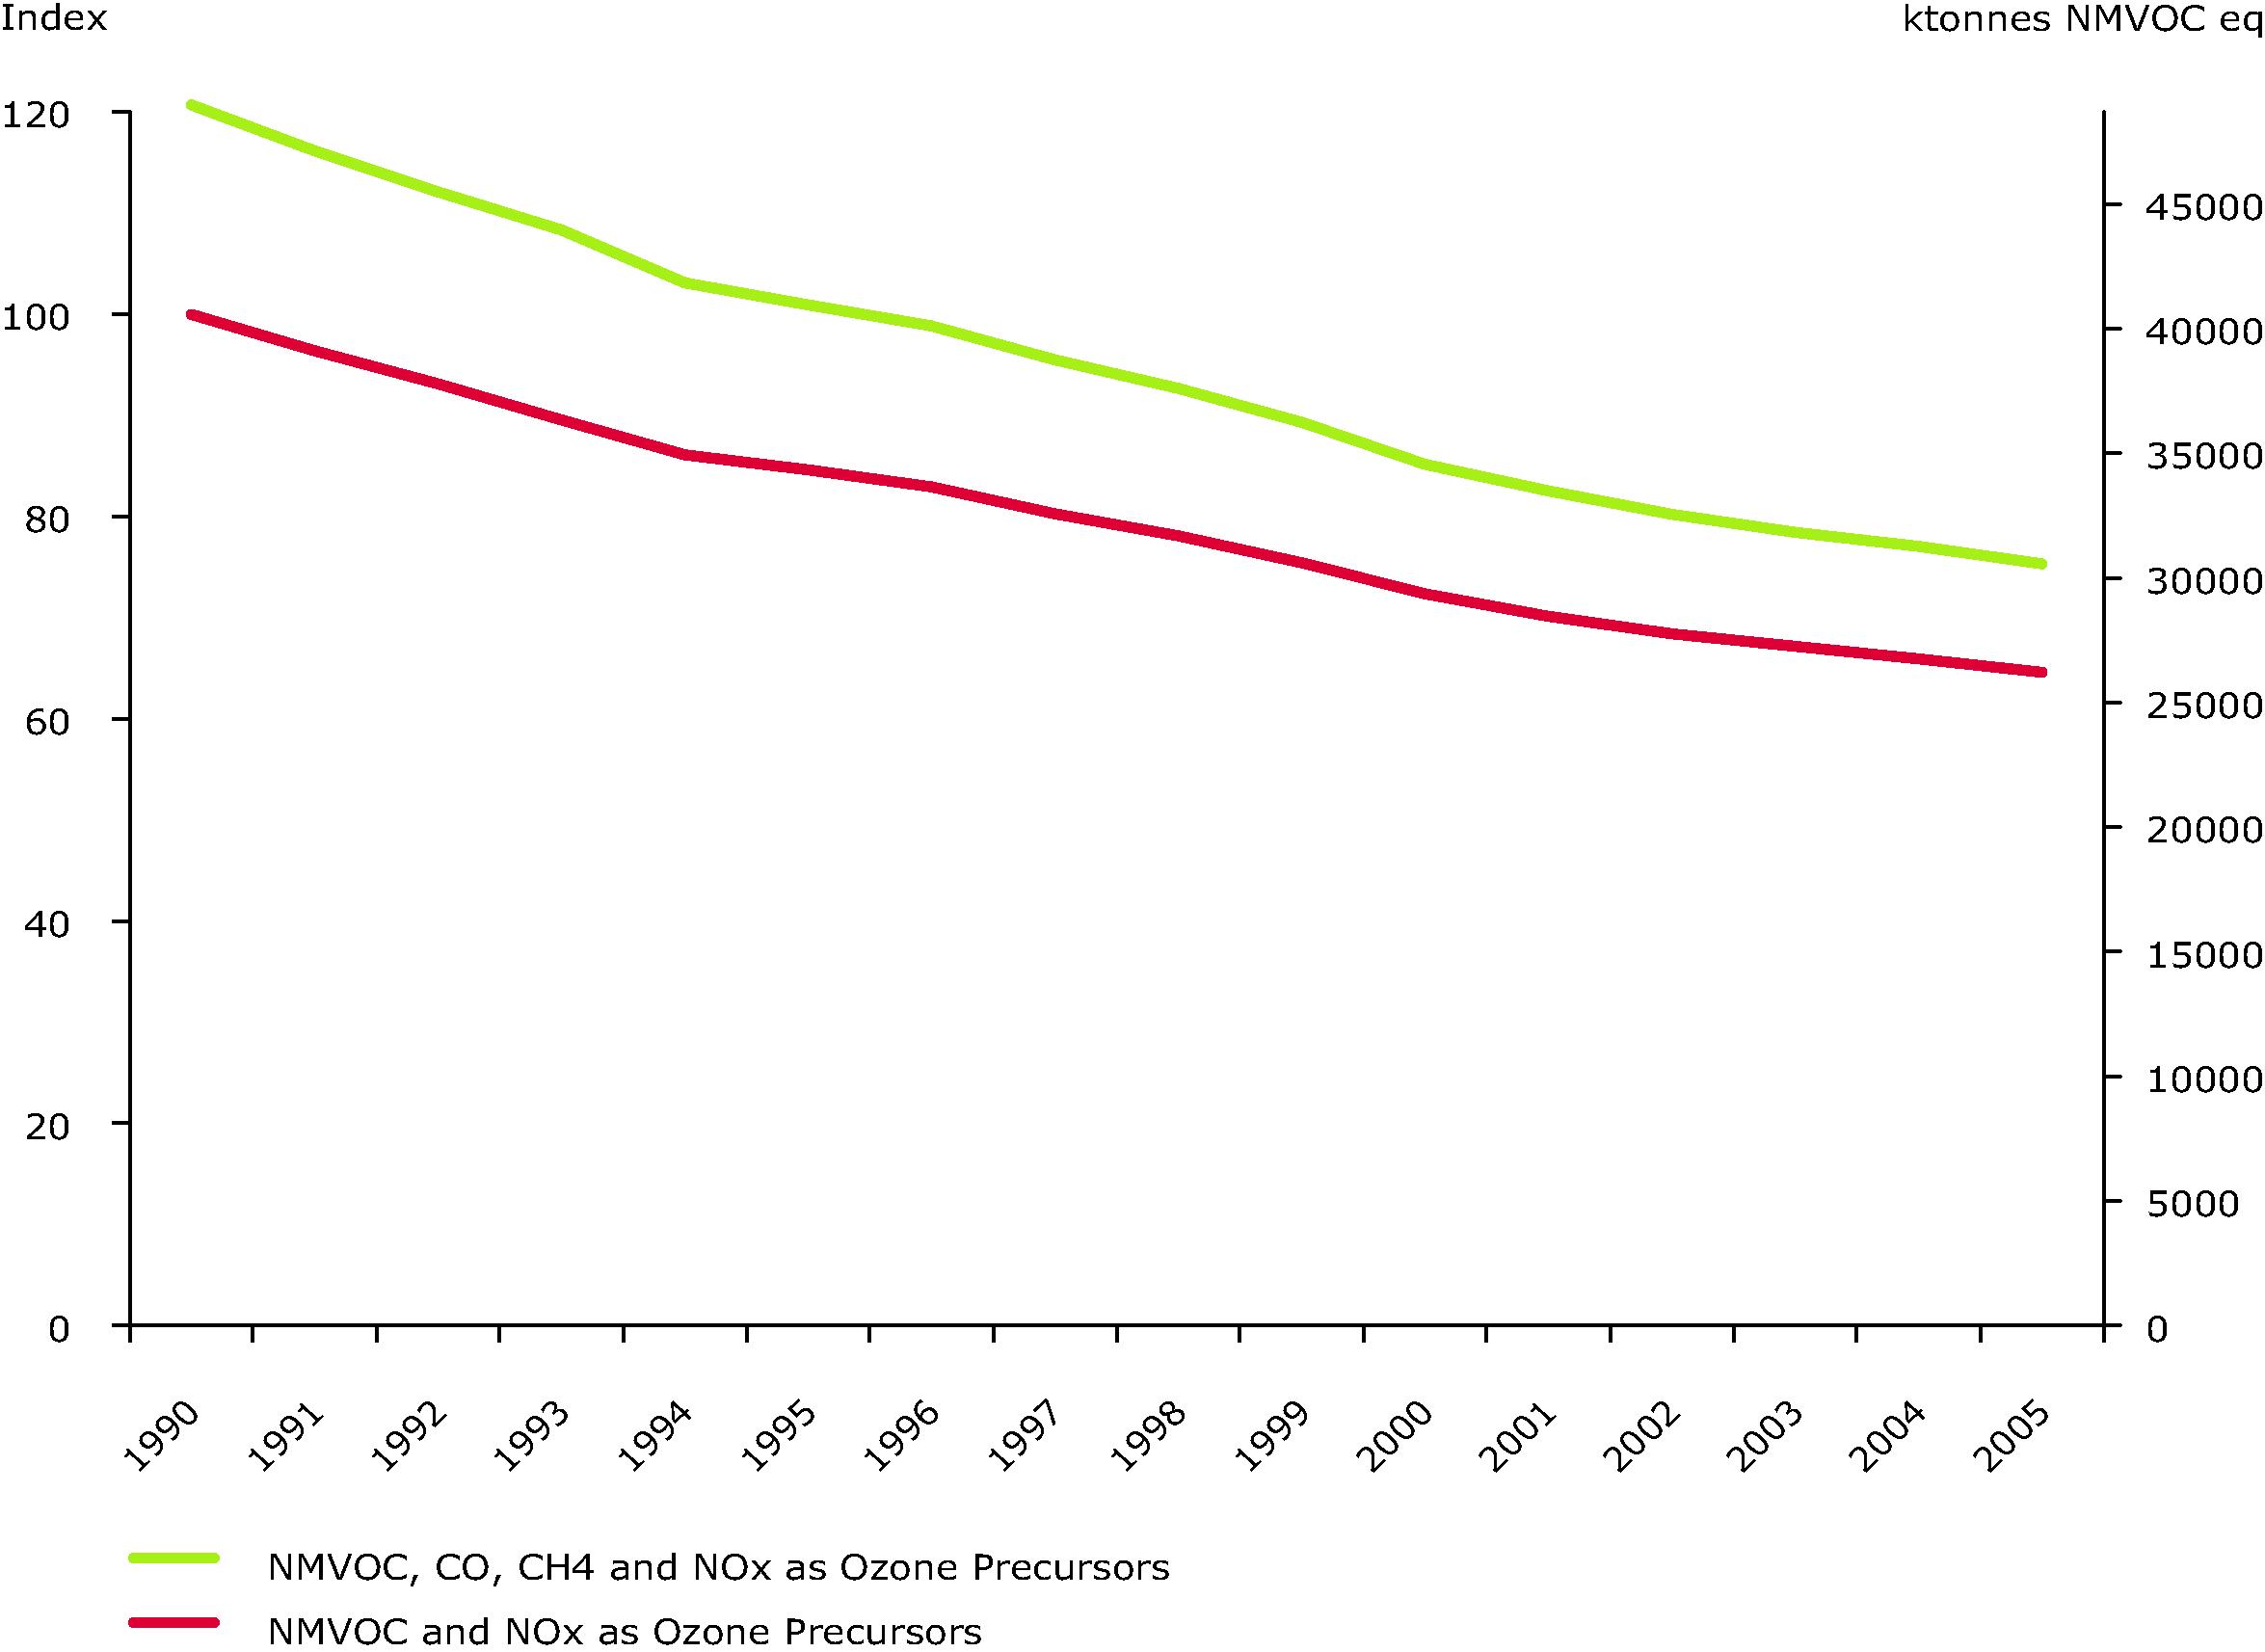 Emissions of ozone precursors (EEA member countries)